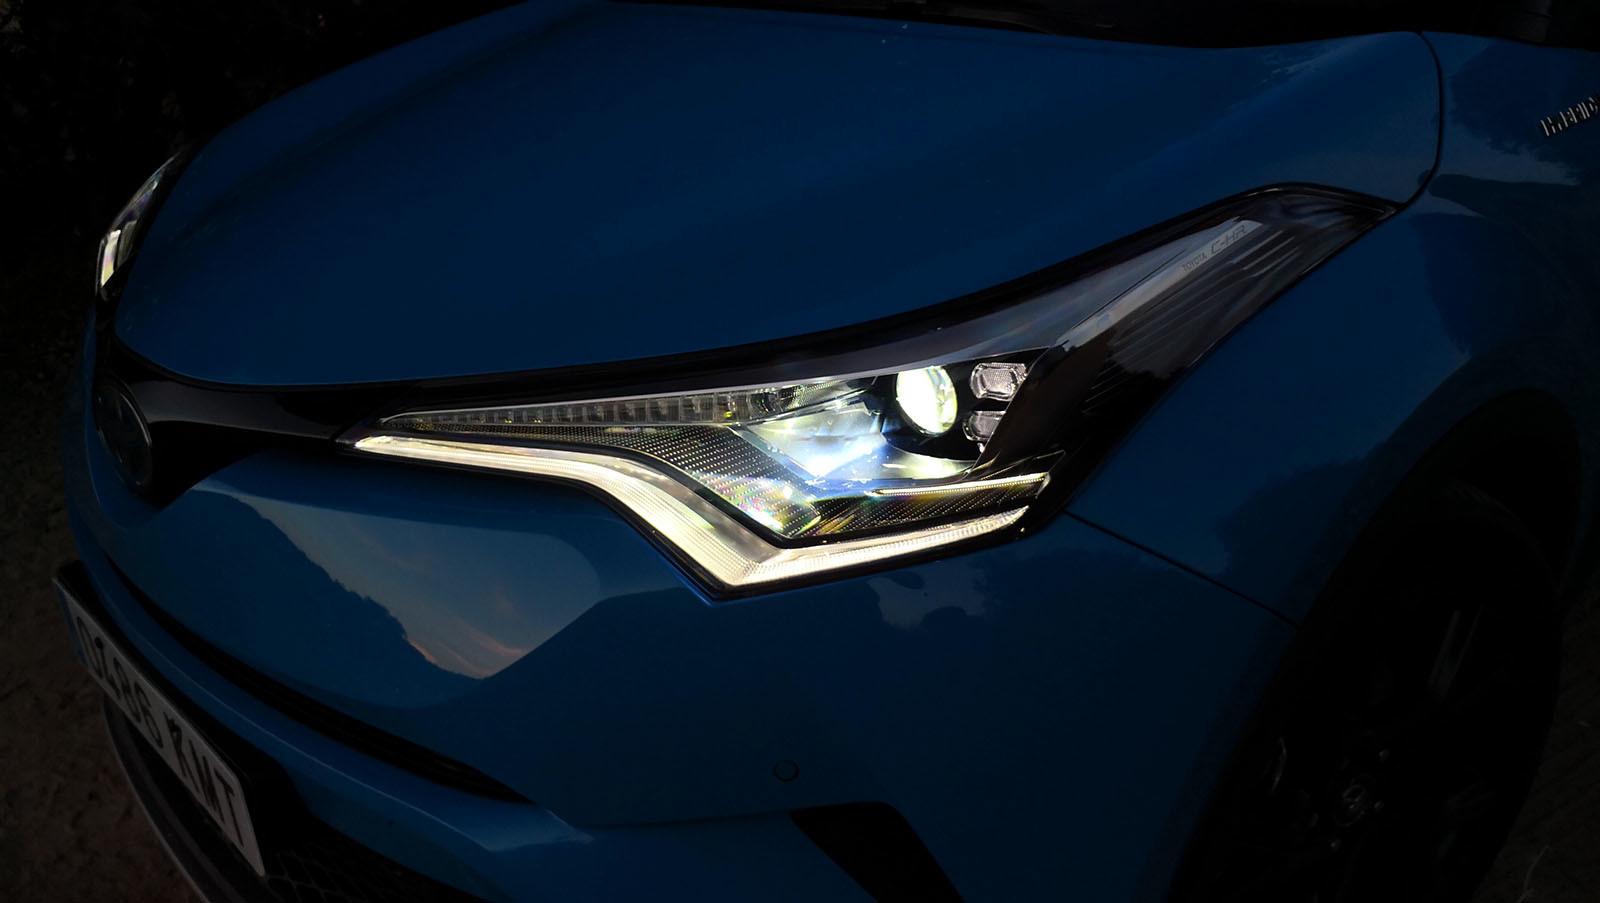 Foto de Toyota C-HR Dynamic Plus - Fotos interiores y detalles (12/15)